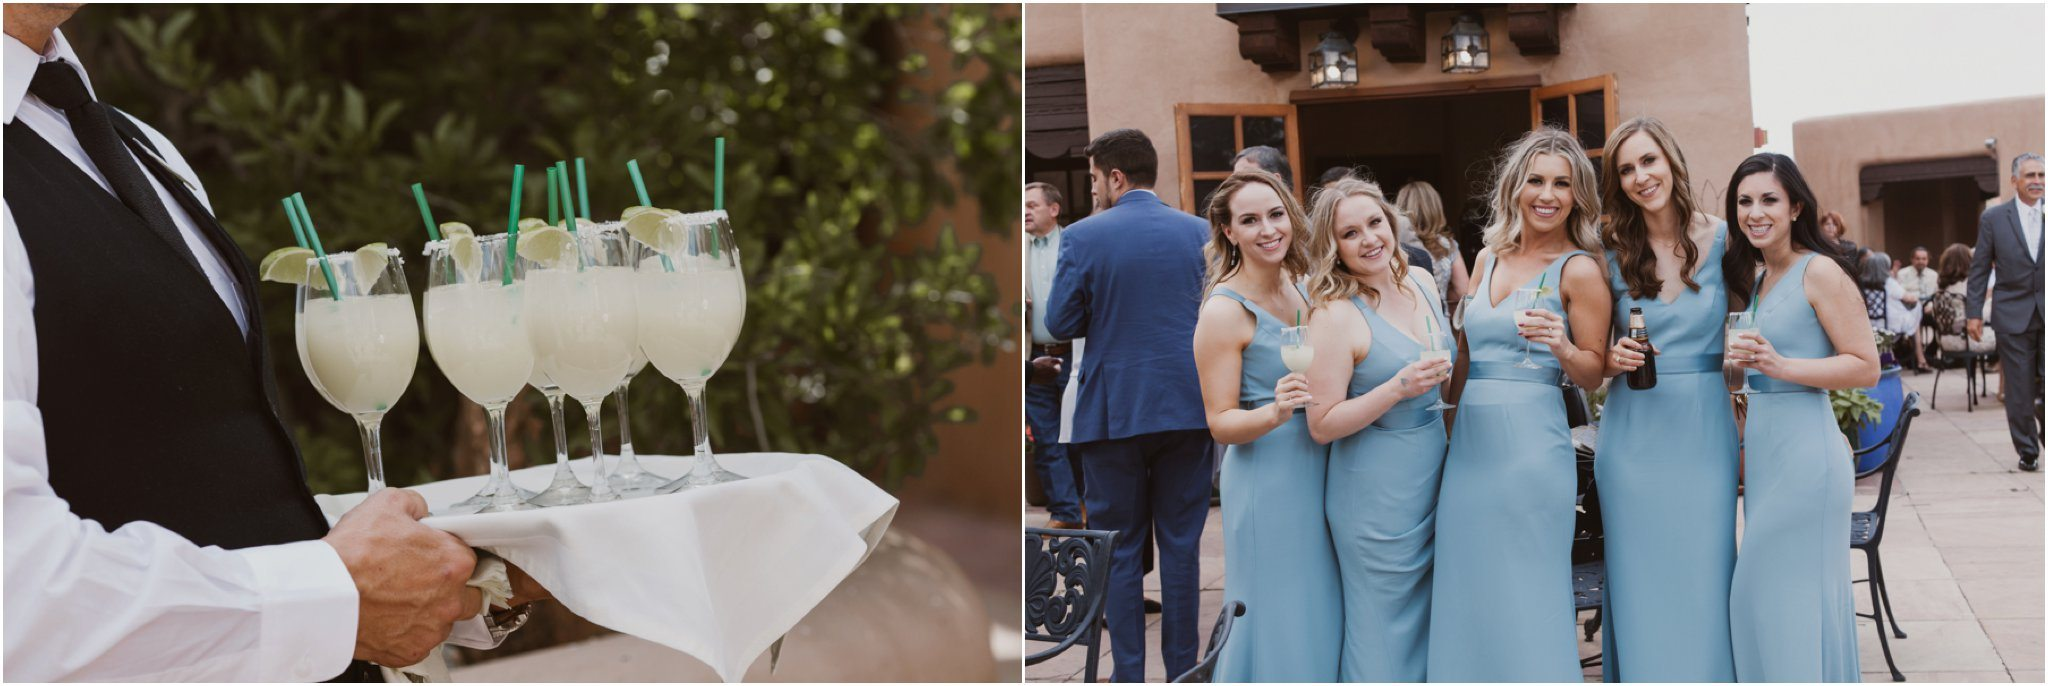 30Blue Rose Photography_ Albuquerque_ Santa Fe_ New Mexico wedding photographers